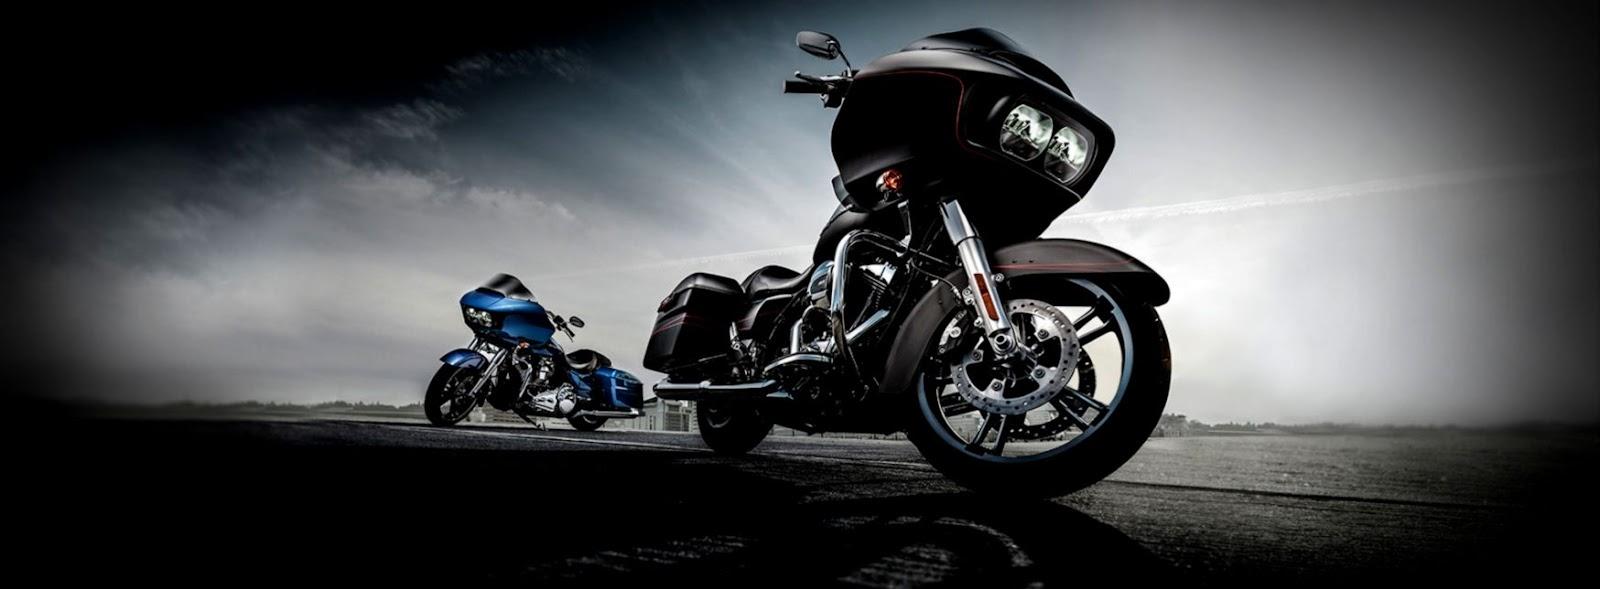 Harley Davidson Wallpaper Model Wallpapers Quality